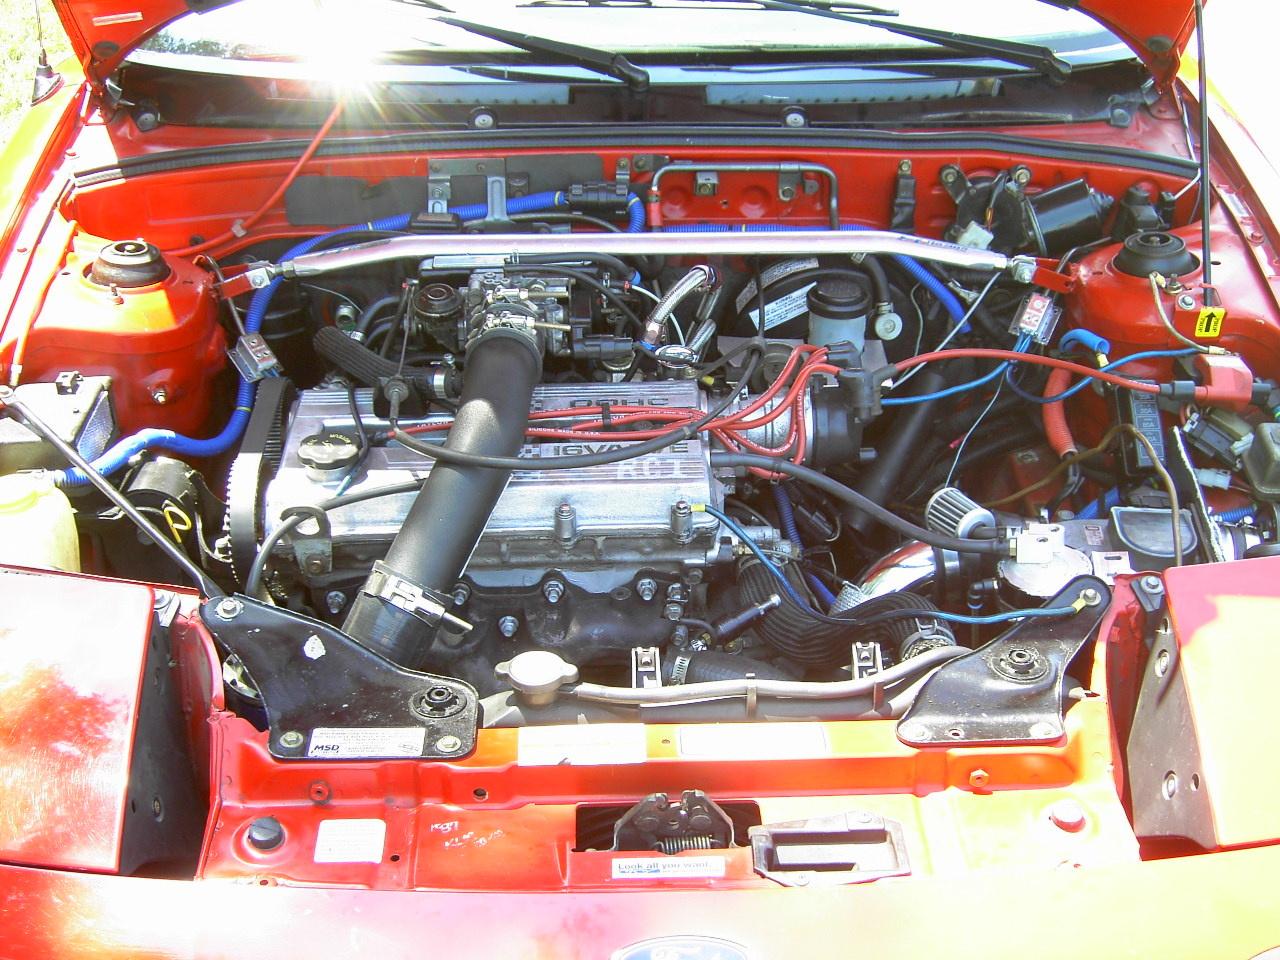 Mazda Protege Questions Turba Cargurus 2003 Alarm Wiring Diagram Mark Helpful